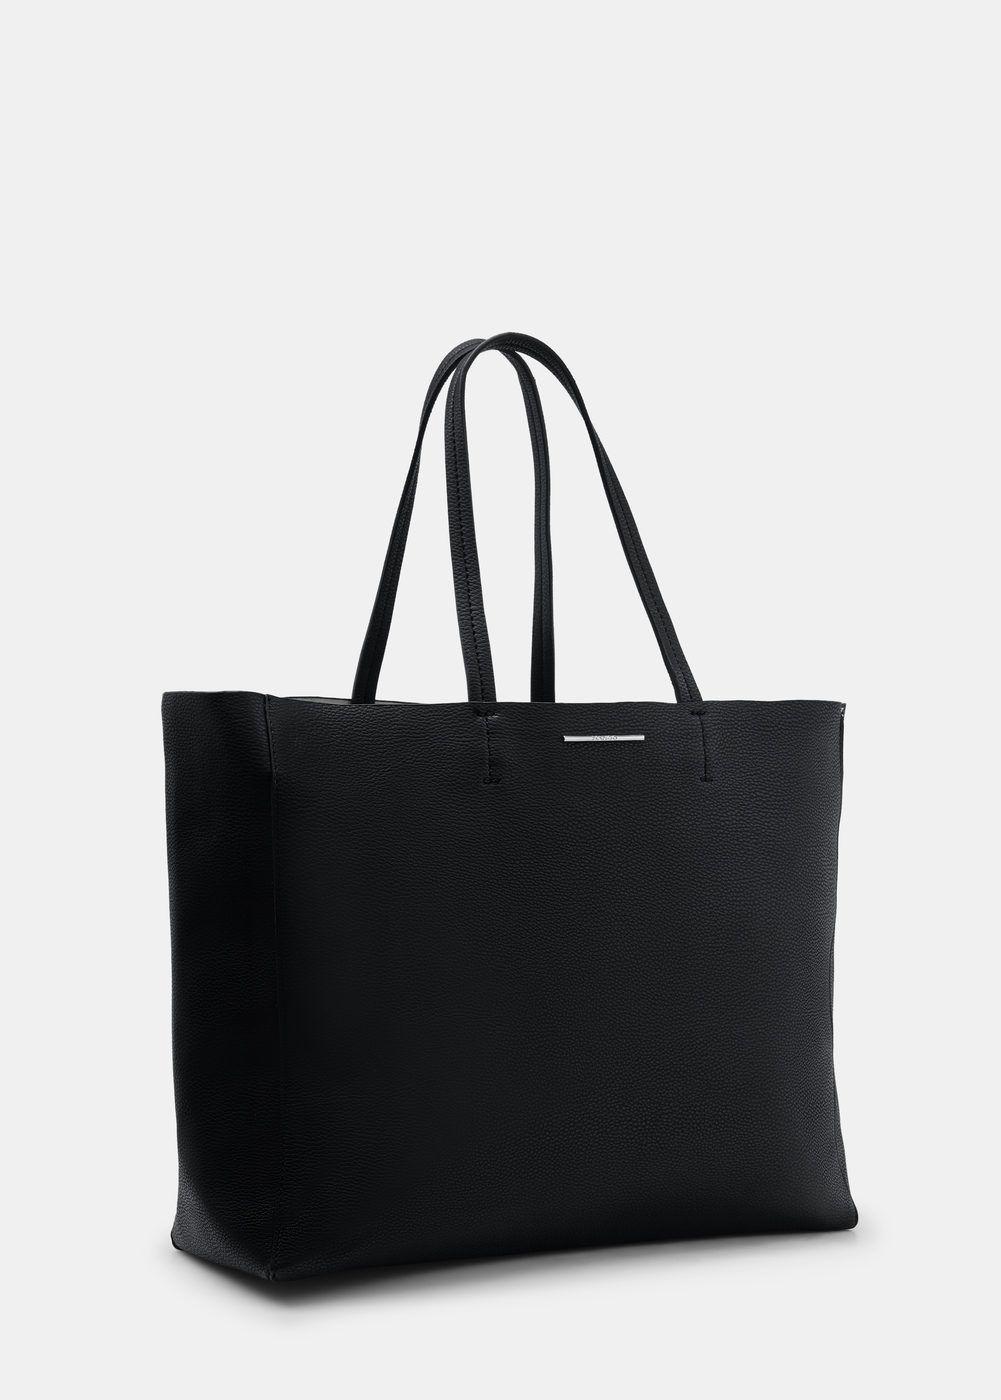 06a51225e718 2017 2017 Famous Brand Fashion Women Bags Michael Kally Mk Lady Pu Leather Handbags  Famous Designer Brand Bags Purse Shoulder Tote Bag Femal…